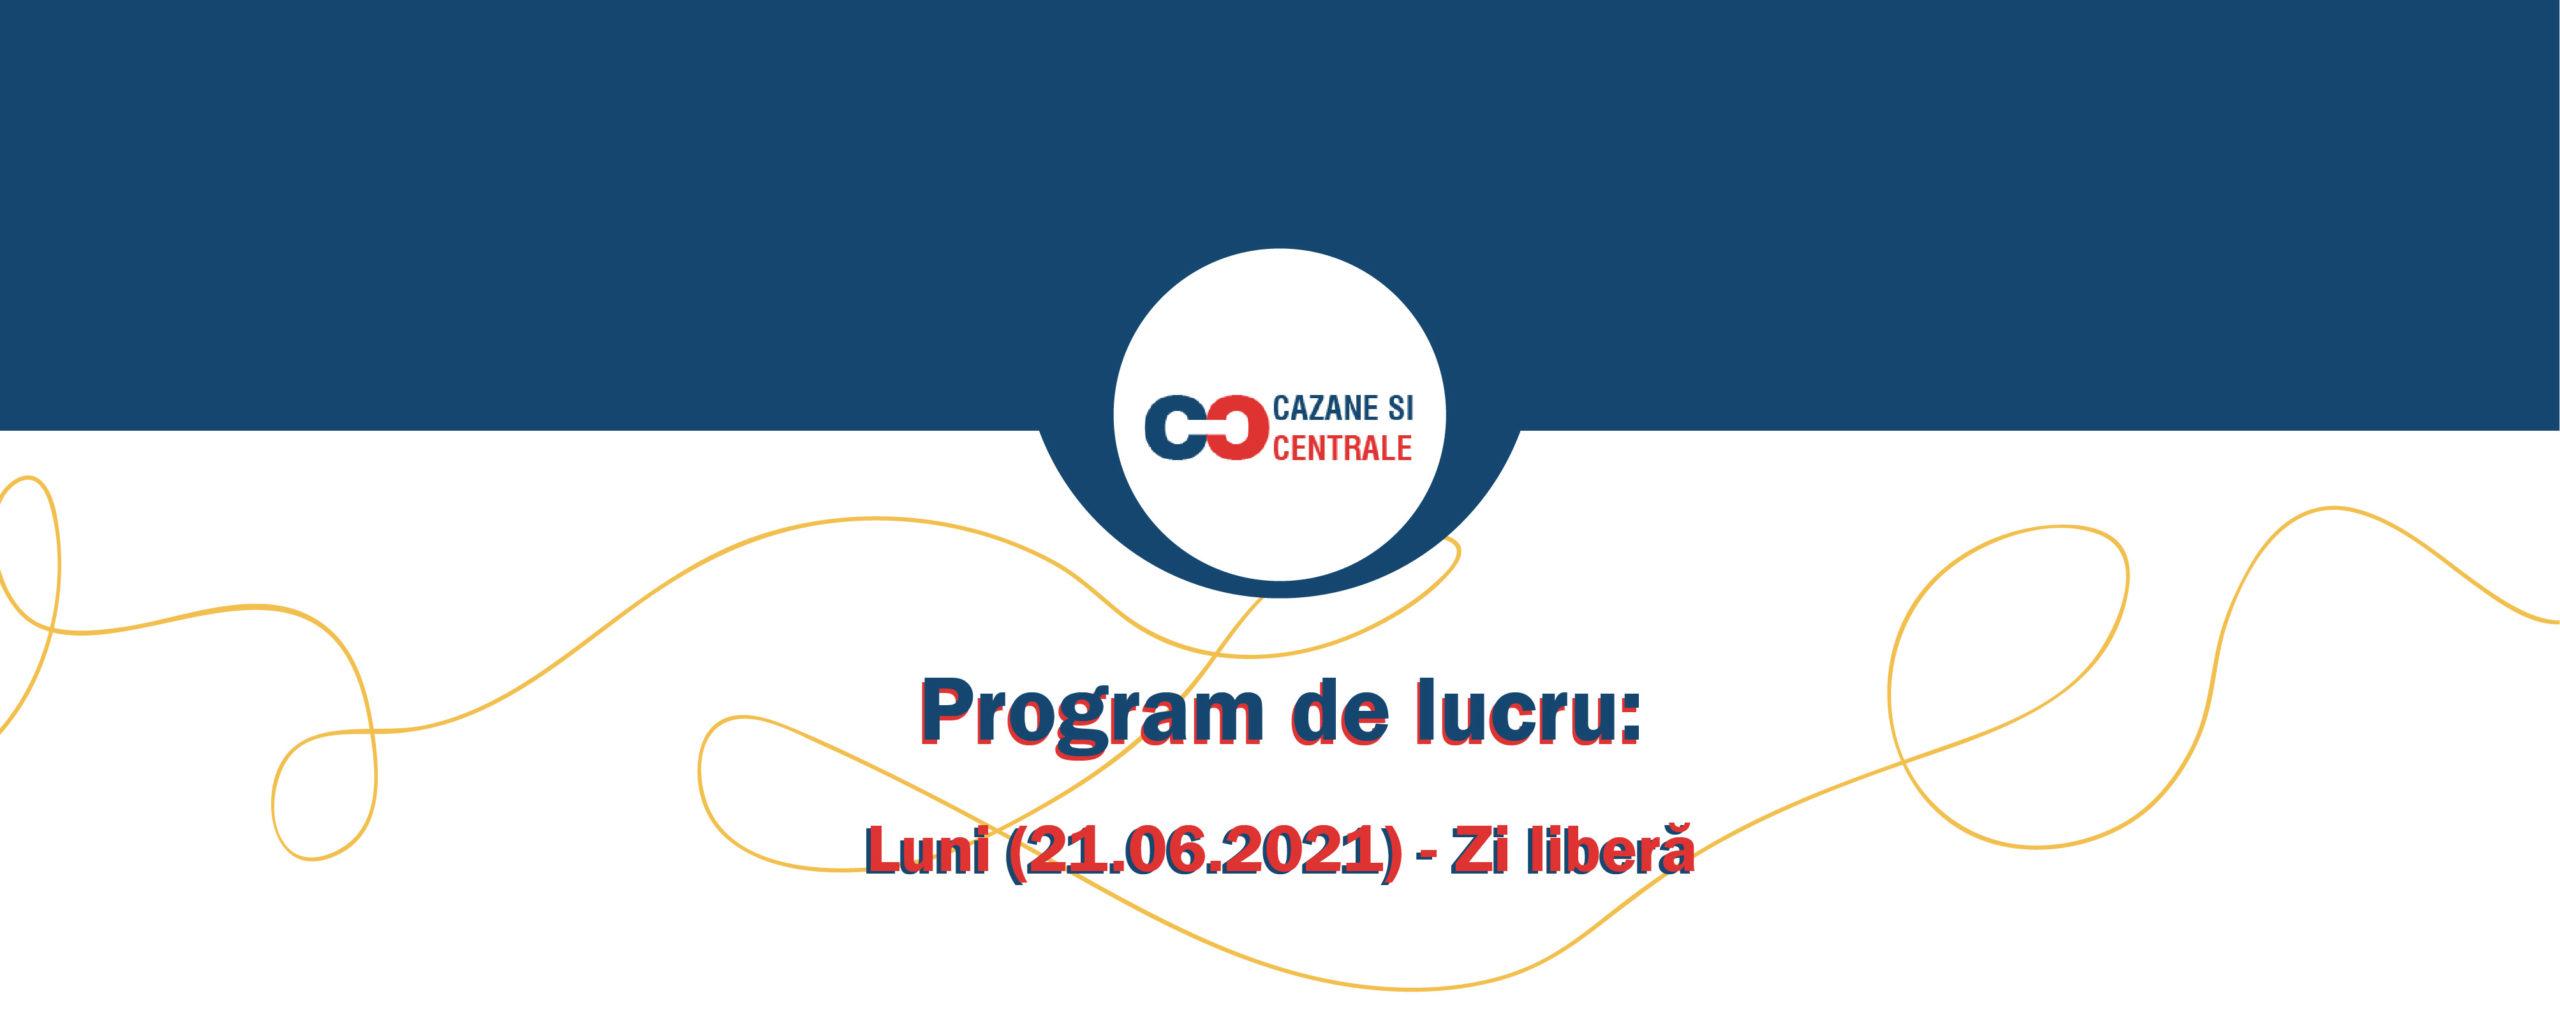 Program 21.06.2021